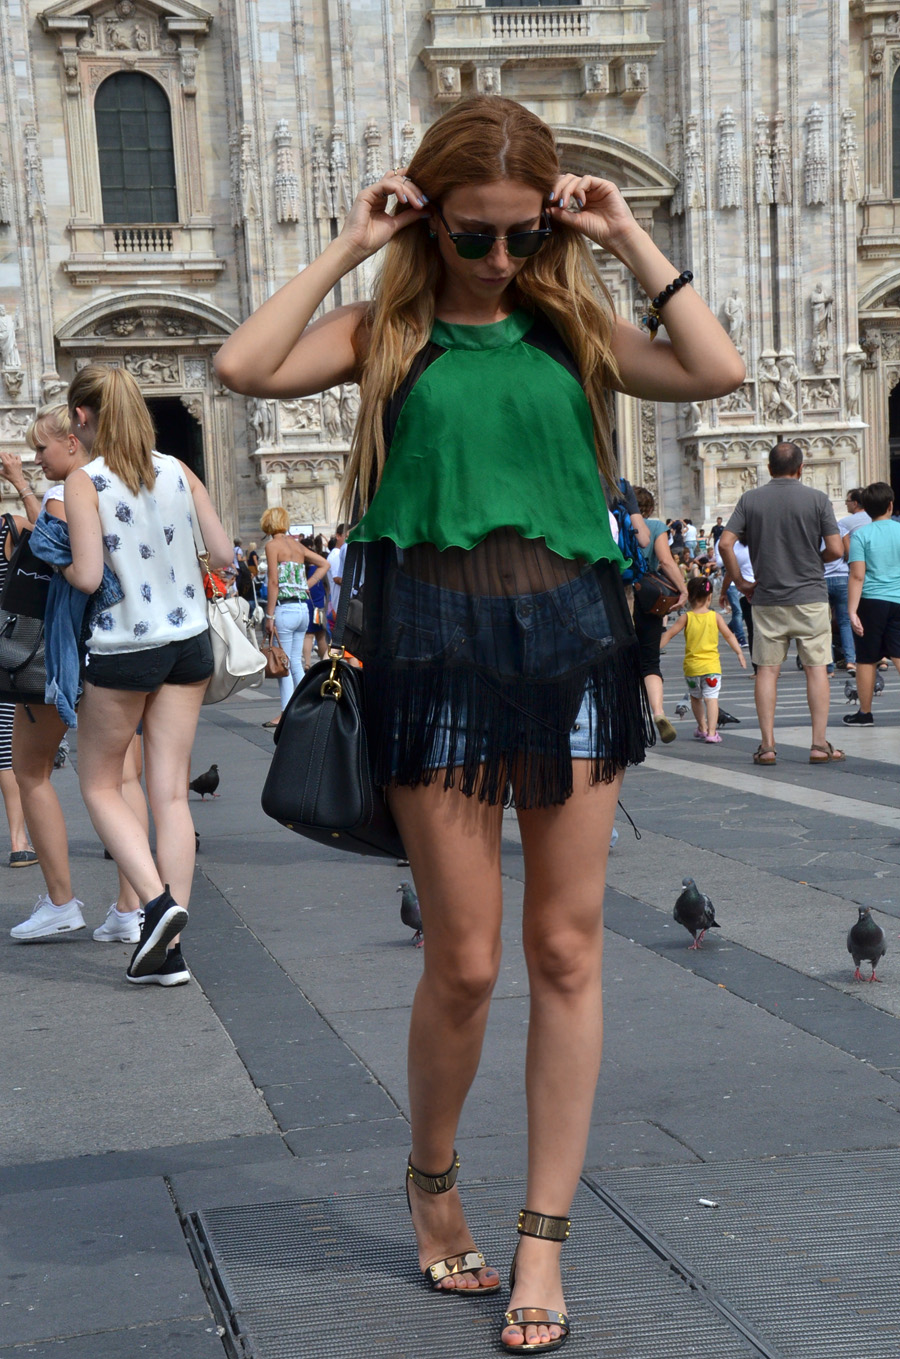 Hello MILAN / Duomo di Milano, Galleria Vittorio Emanuele – Anastasija Stasha OUTFIT